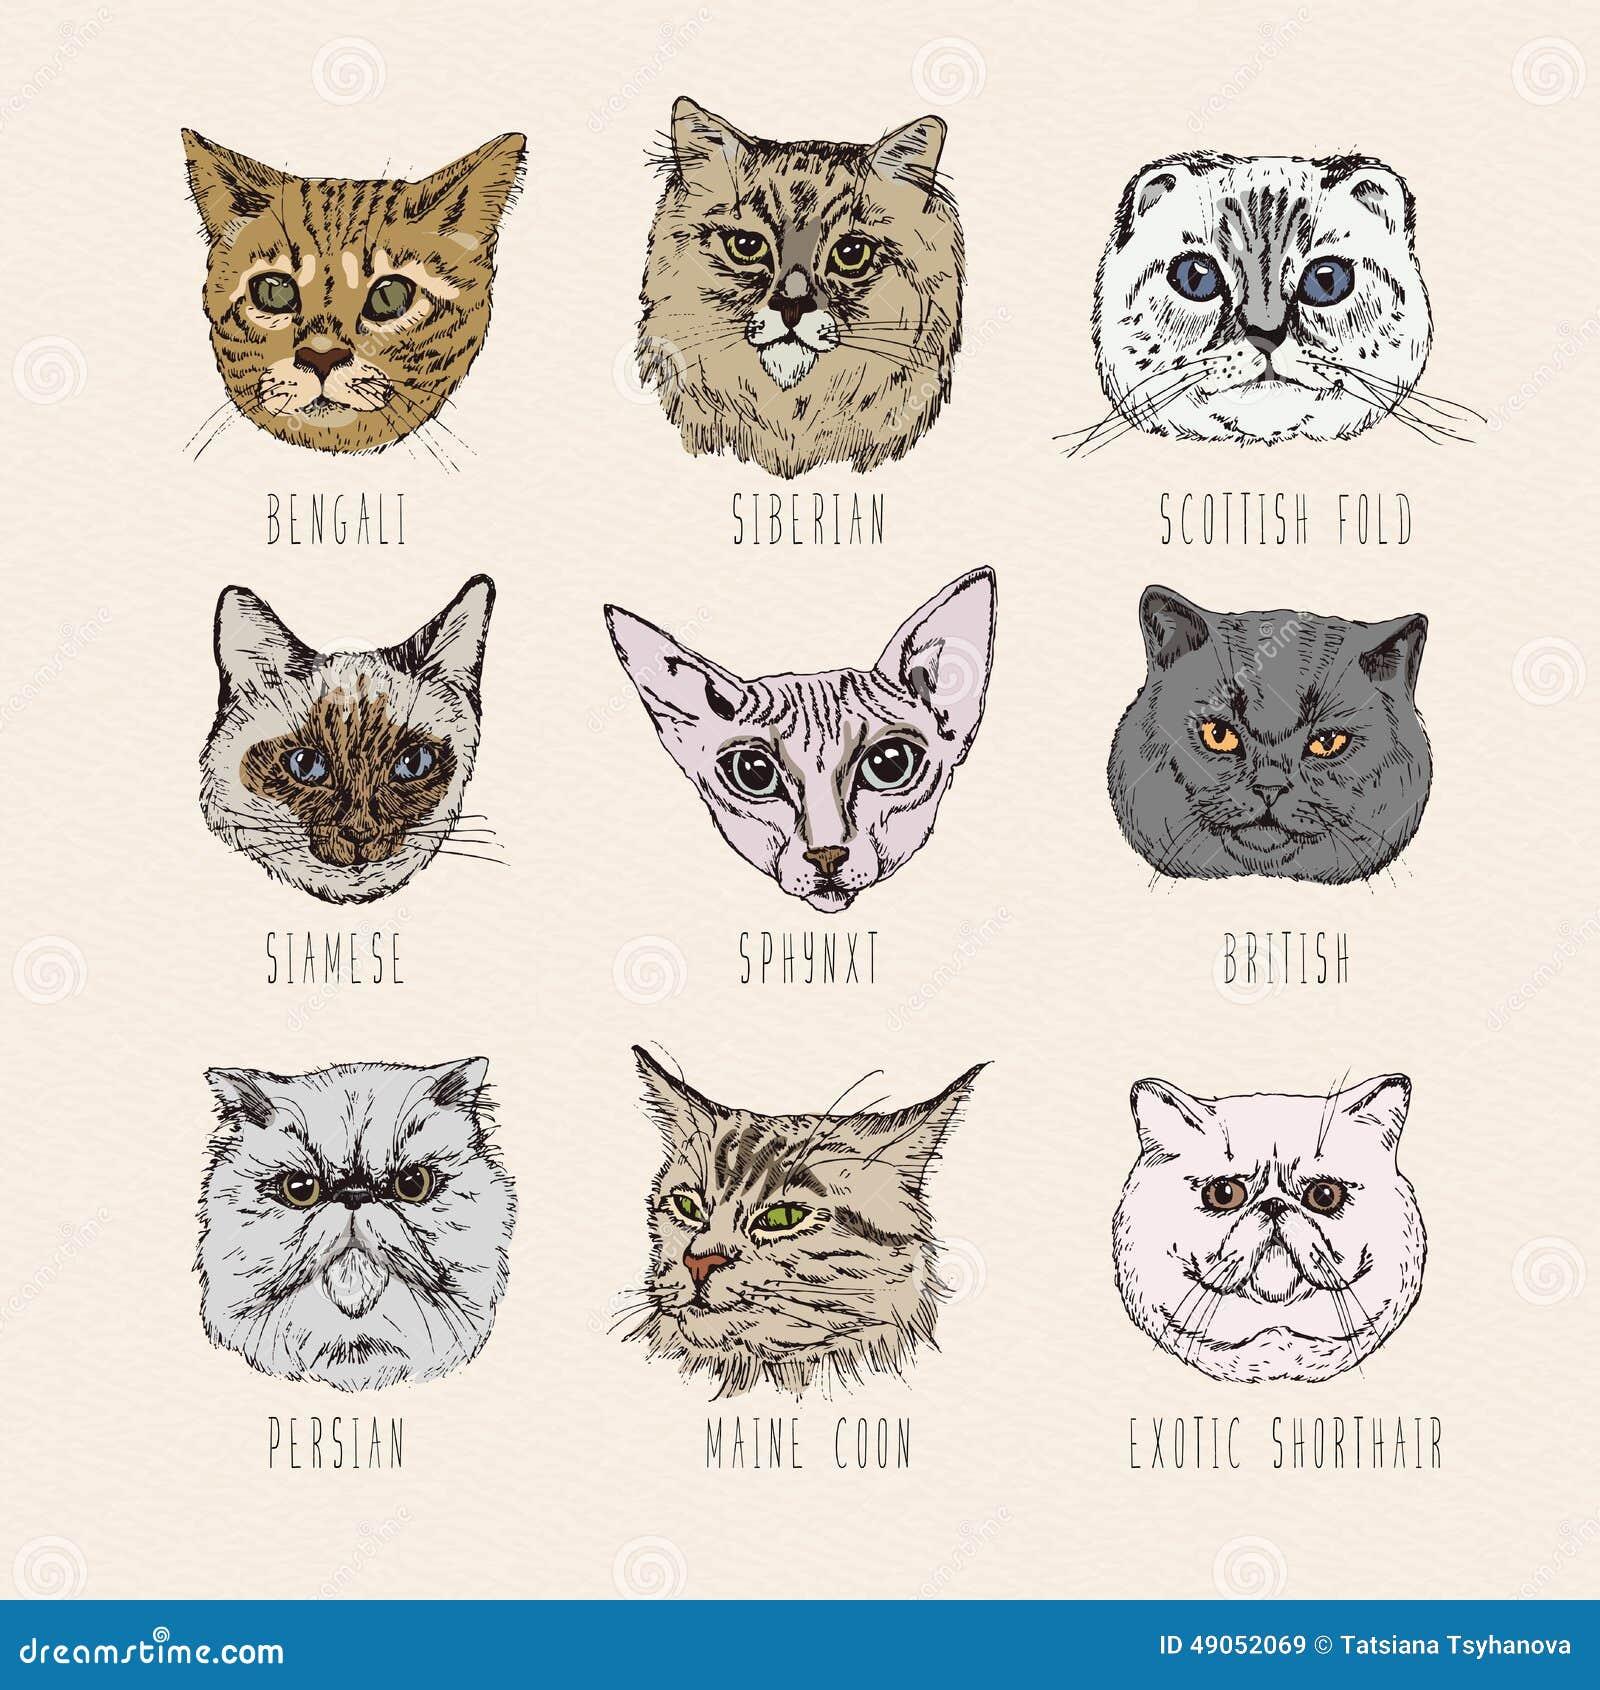 Breeds. Siamese, British, Siberian, Persian, Scottish Fold, Maine Coon ...